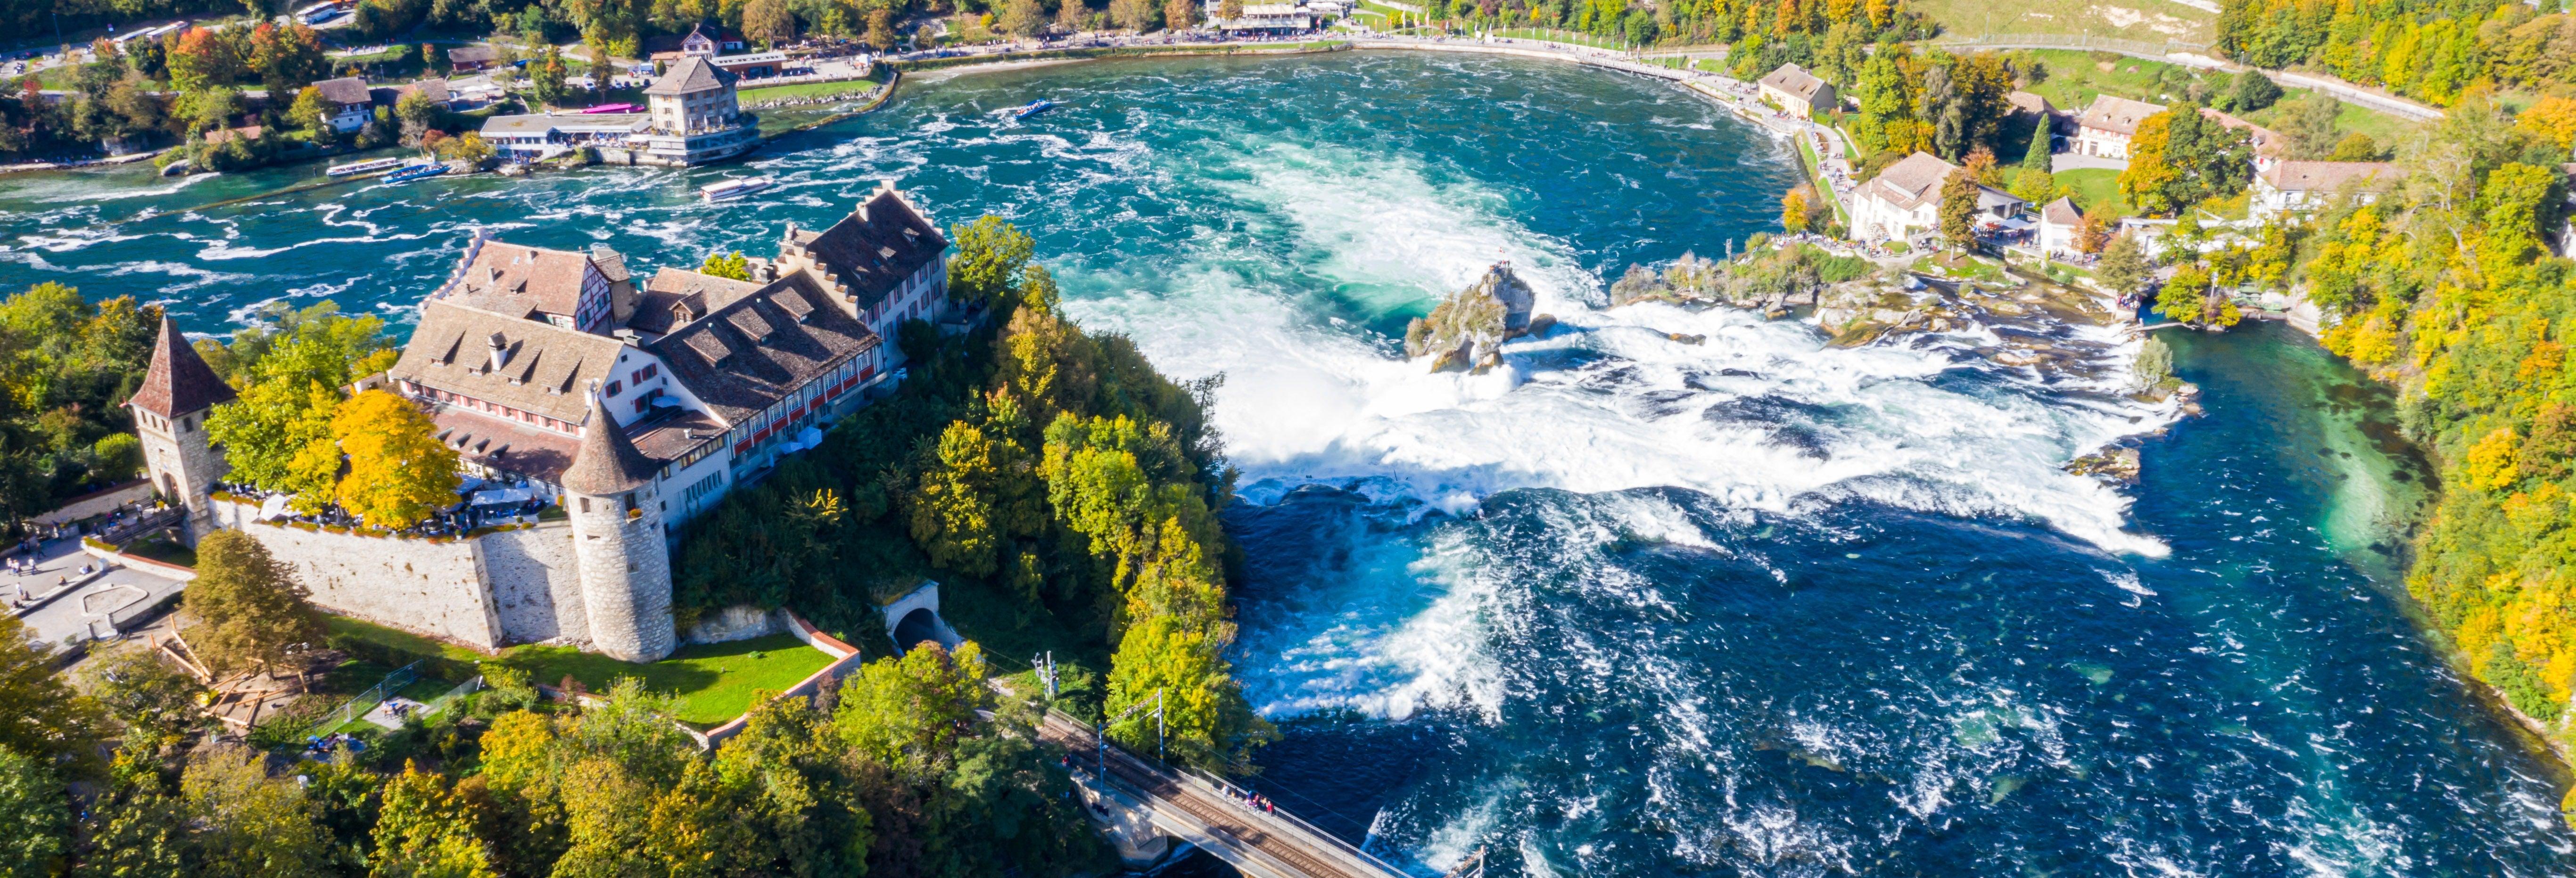 Excursion aux chutes du Rhin